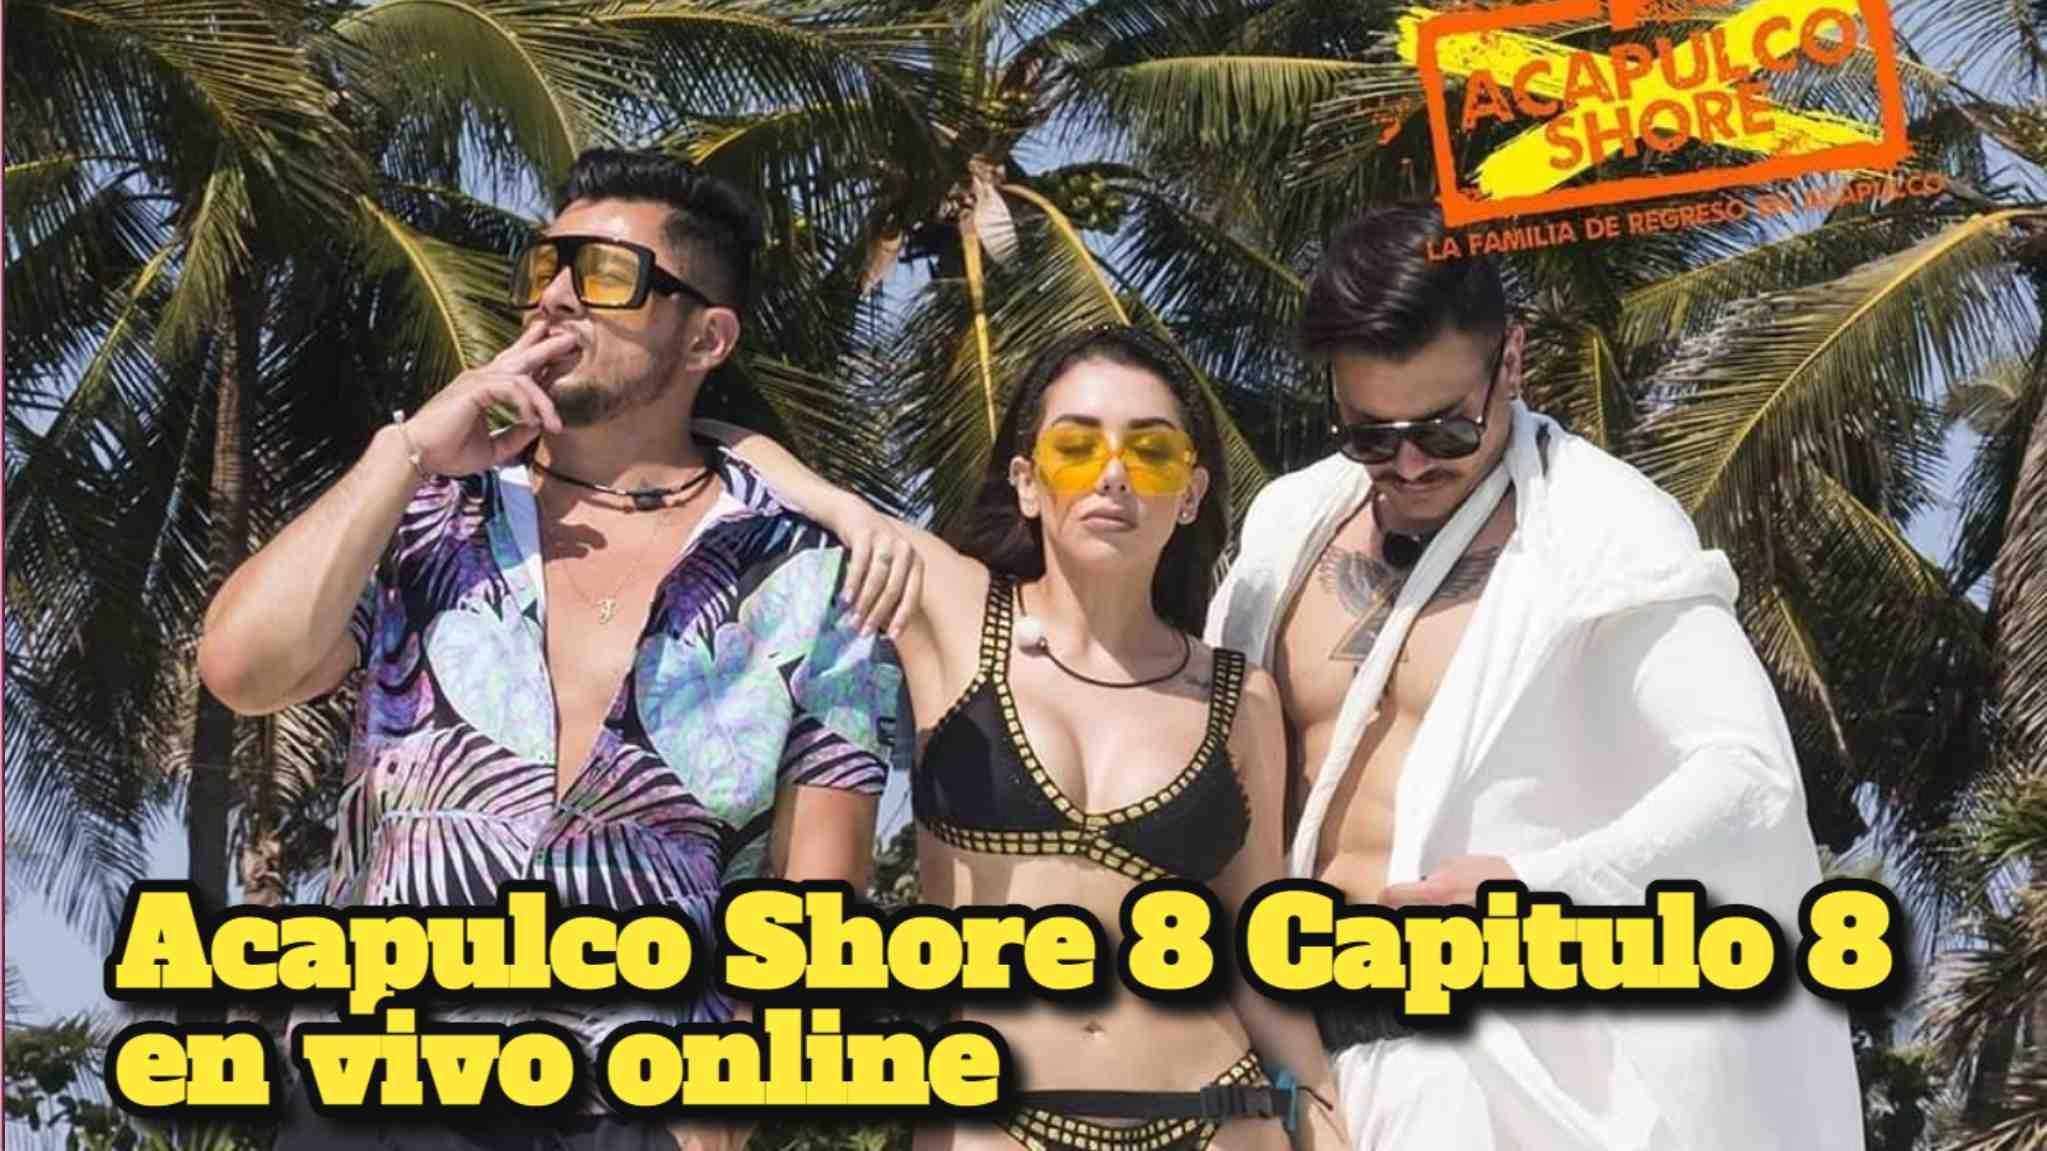 Acapulco Shore 8 Capitulo 8 en vivo online a través de MTV